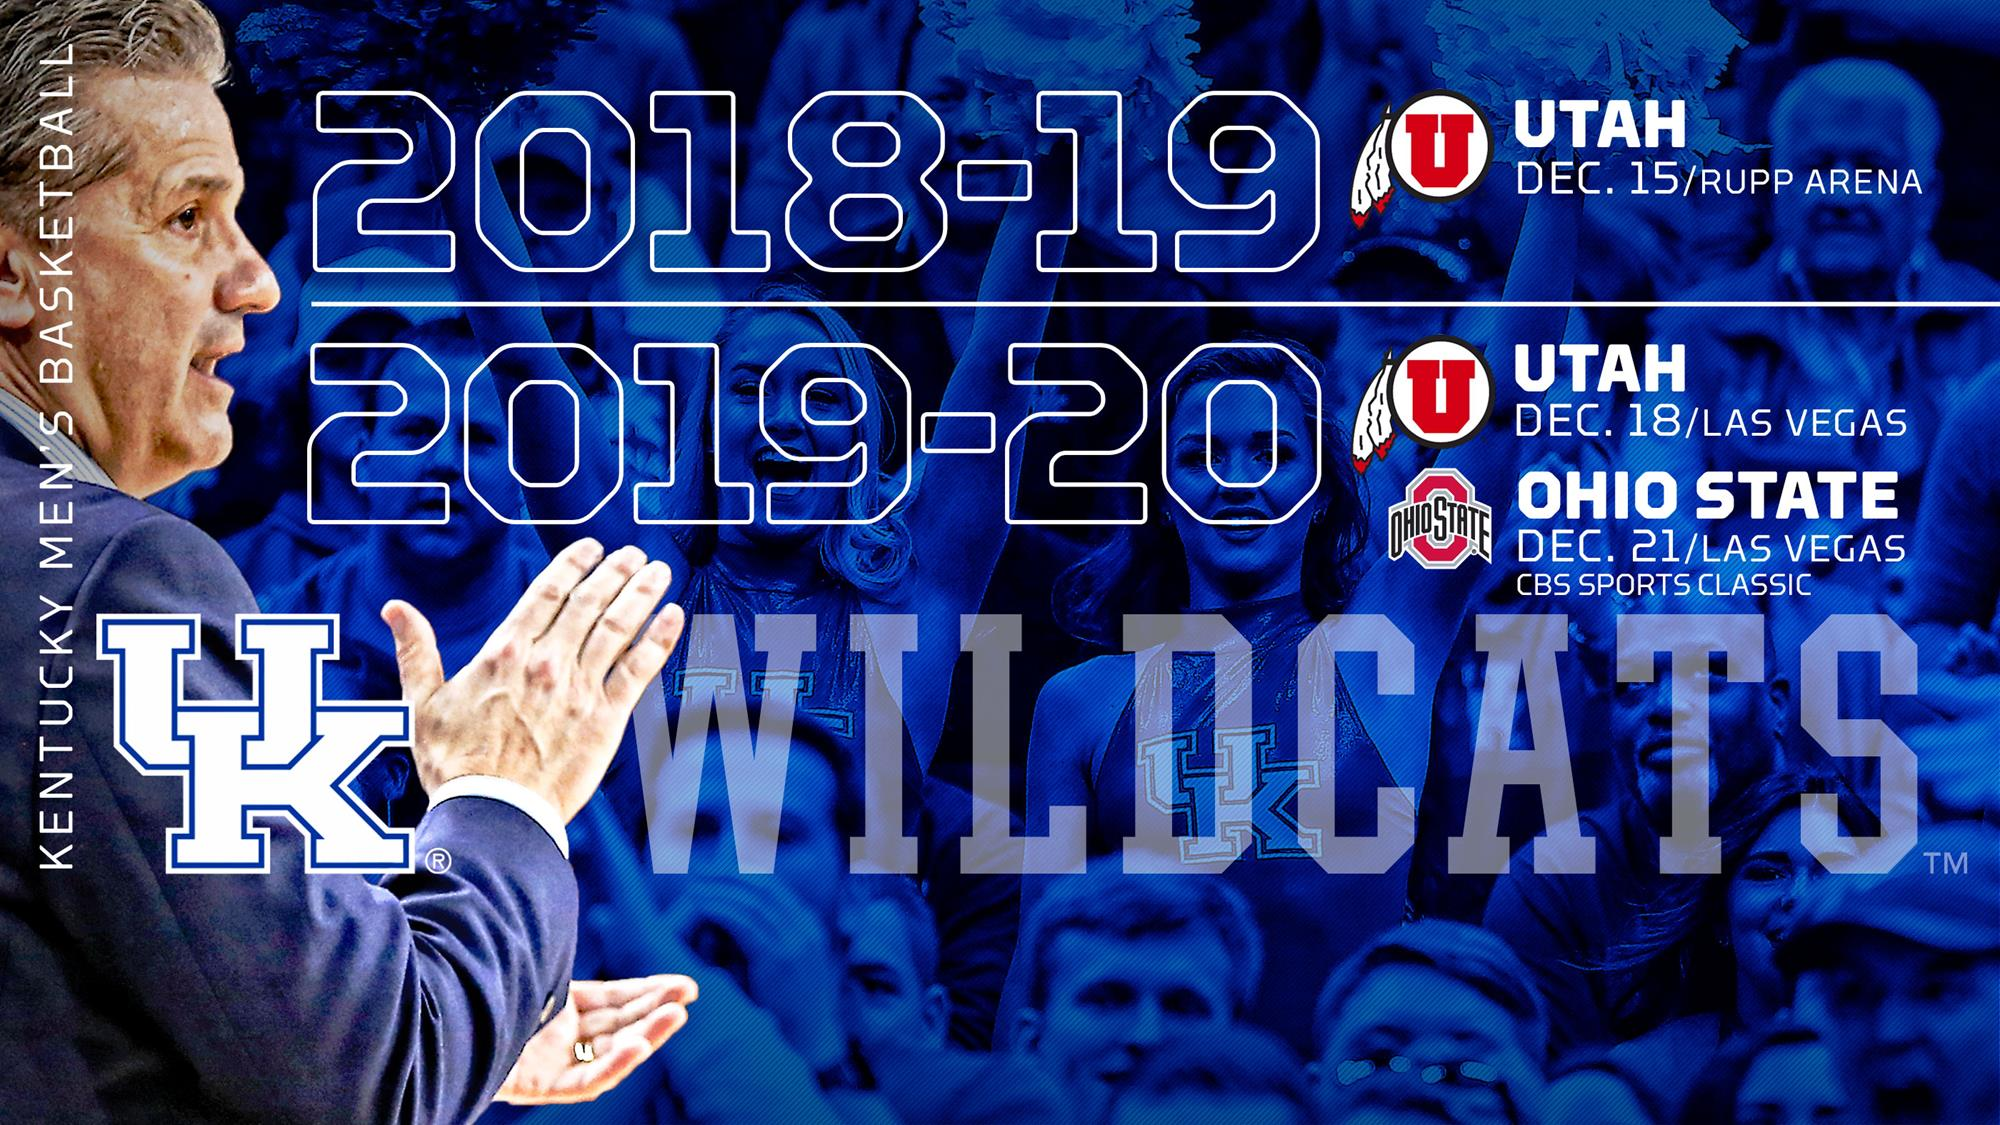 Kentucky to face Utah at Rupp Arena this season